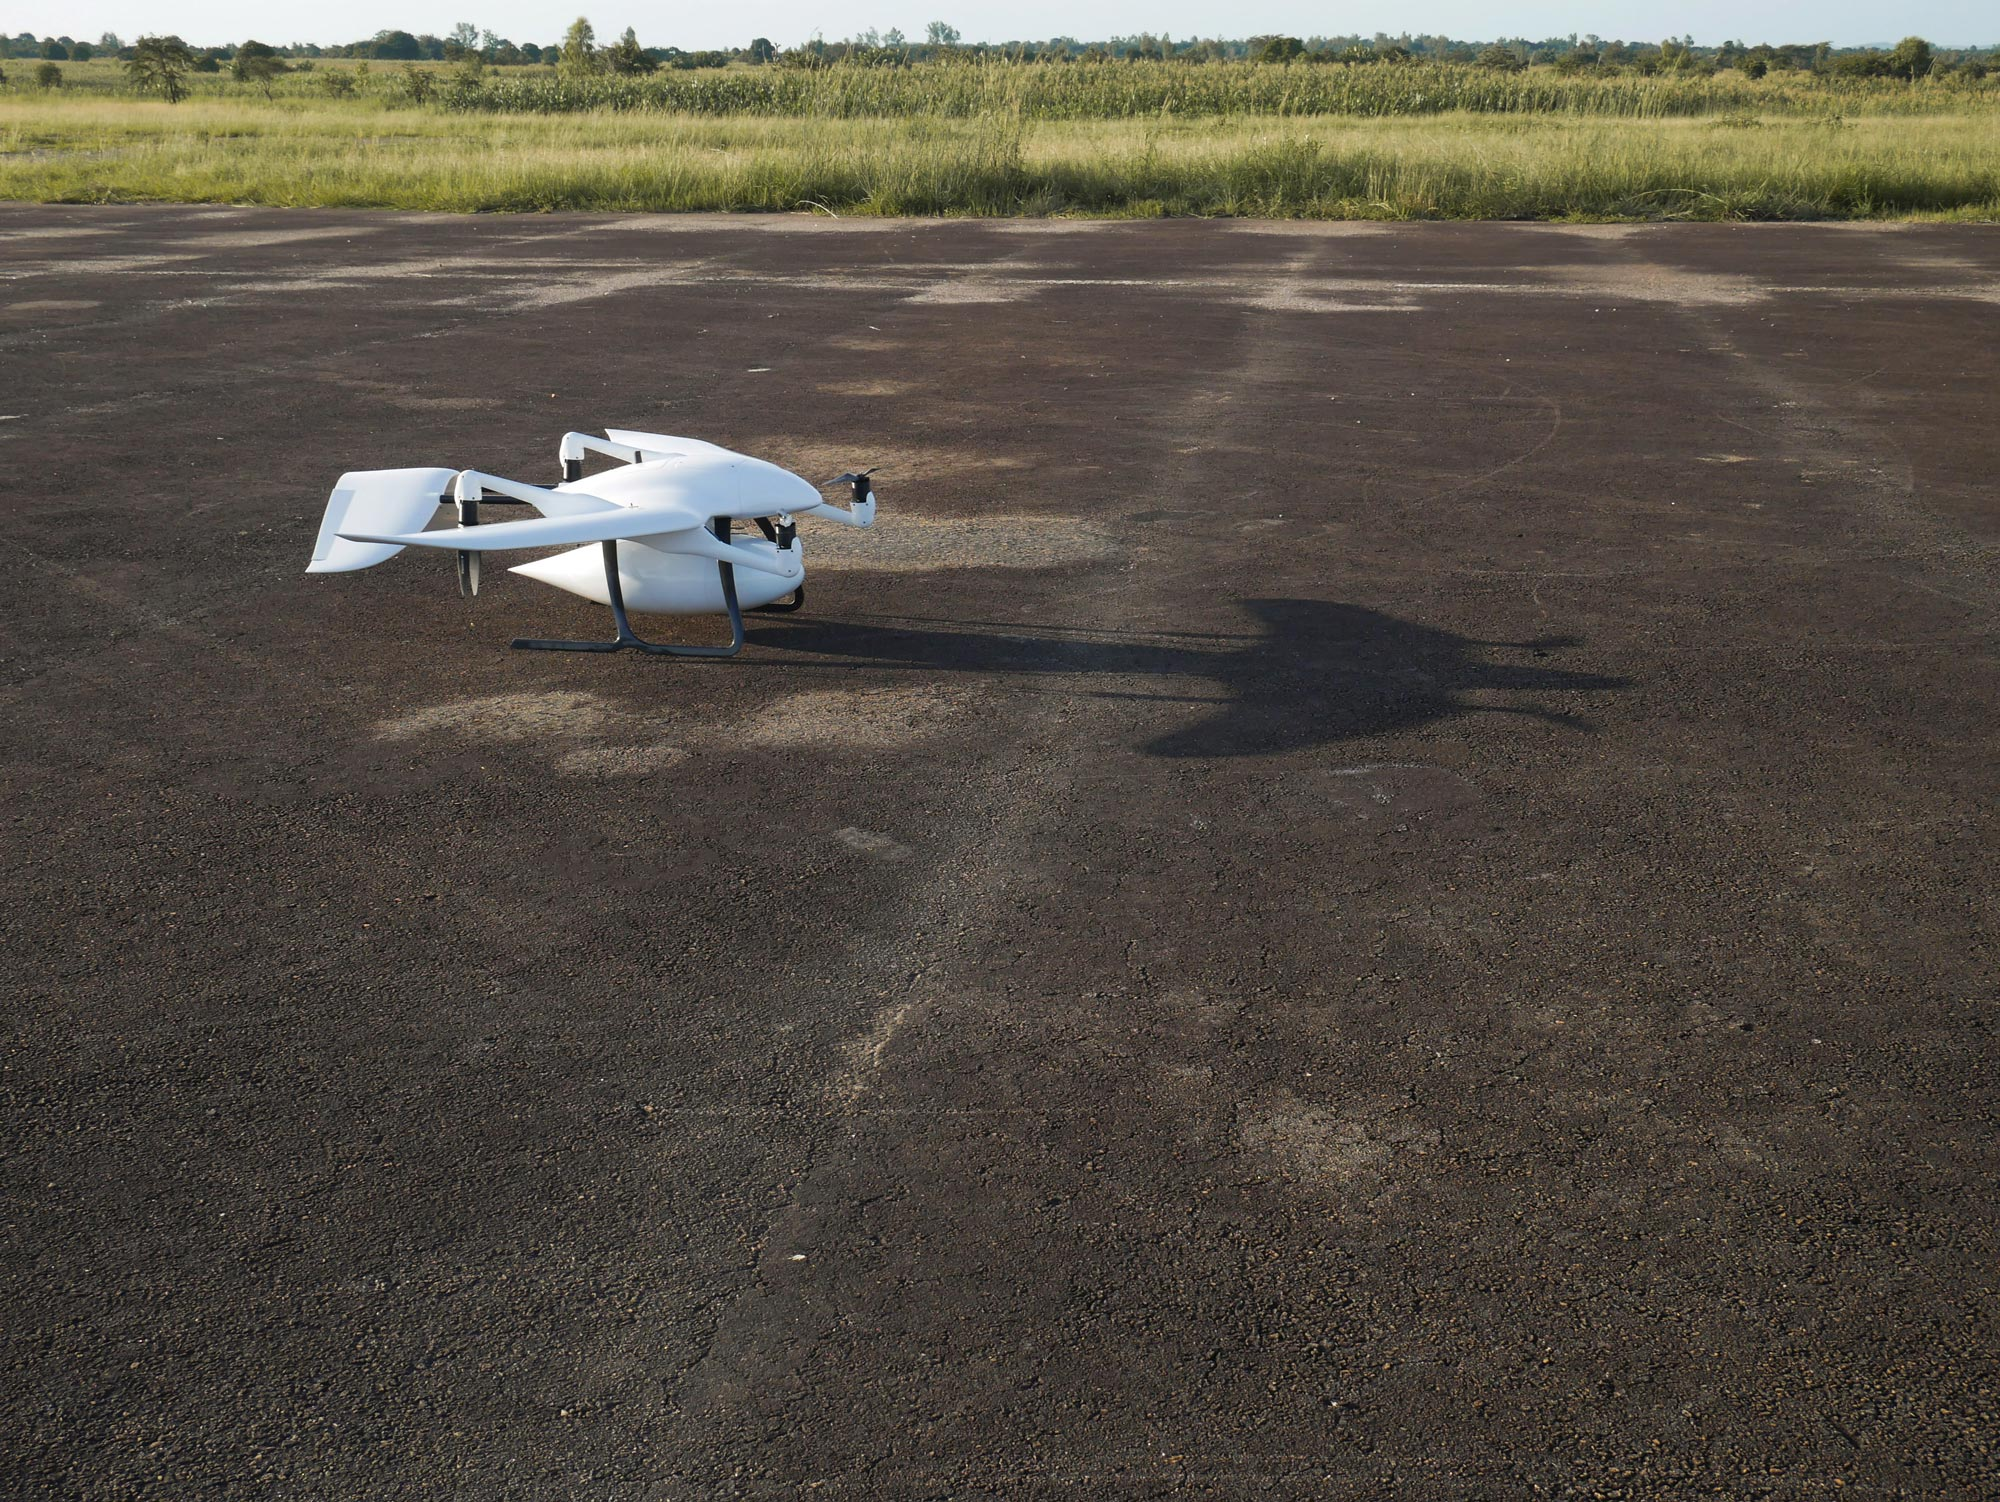 Wingcopter_Malawi_bea-07-bea